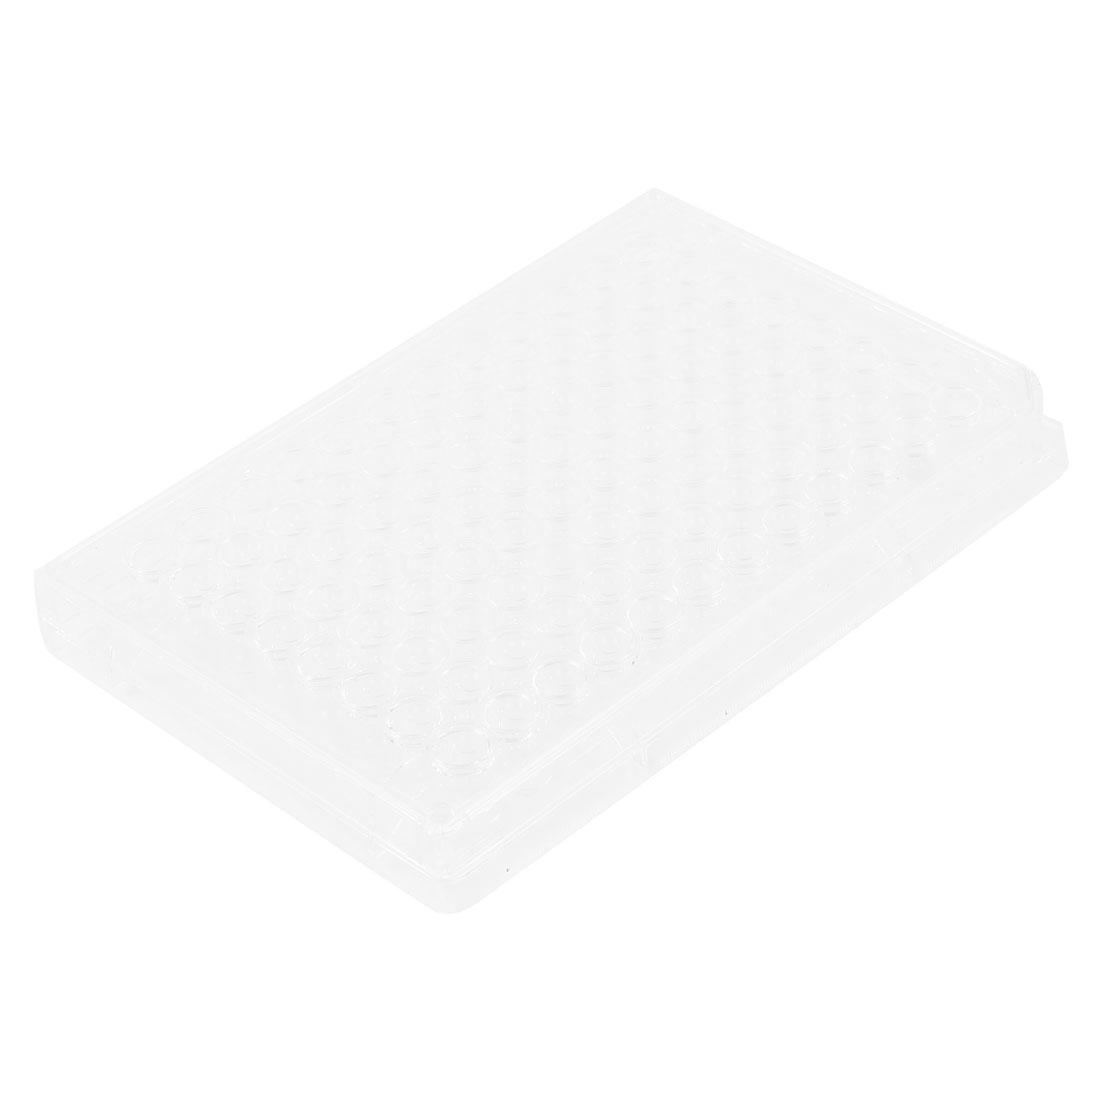 Transparent Plastic Rectangular 96 Slots Cell Culture Plate